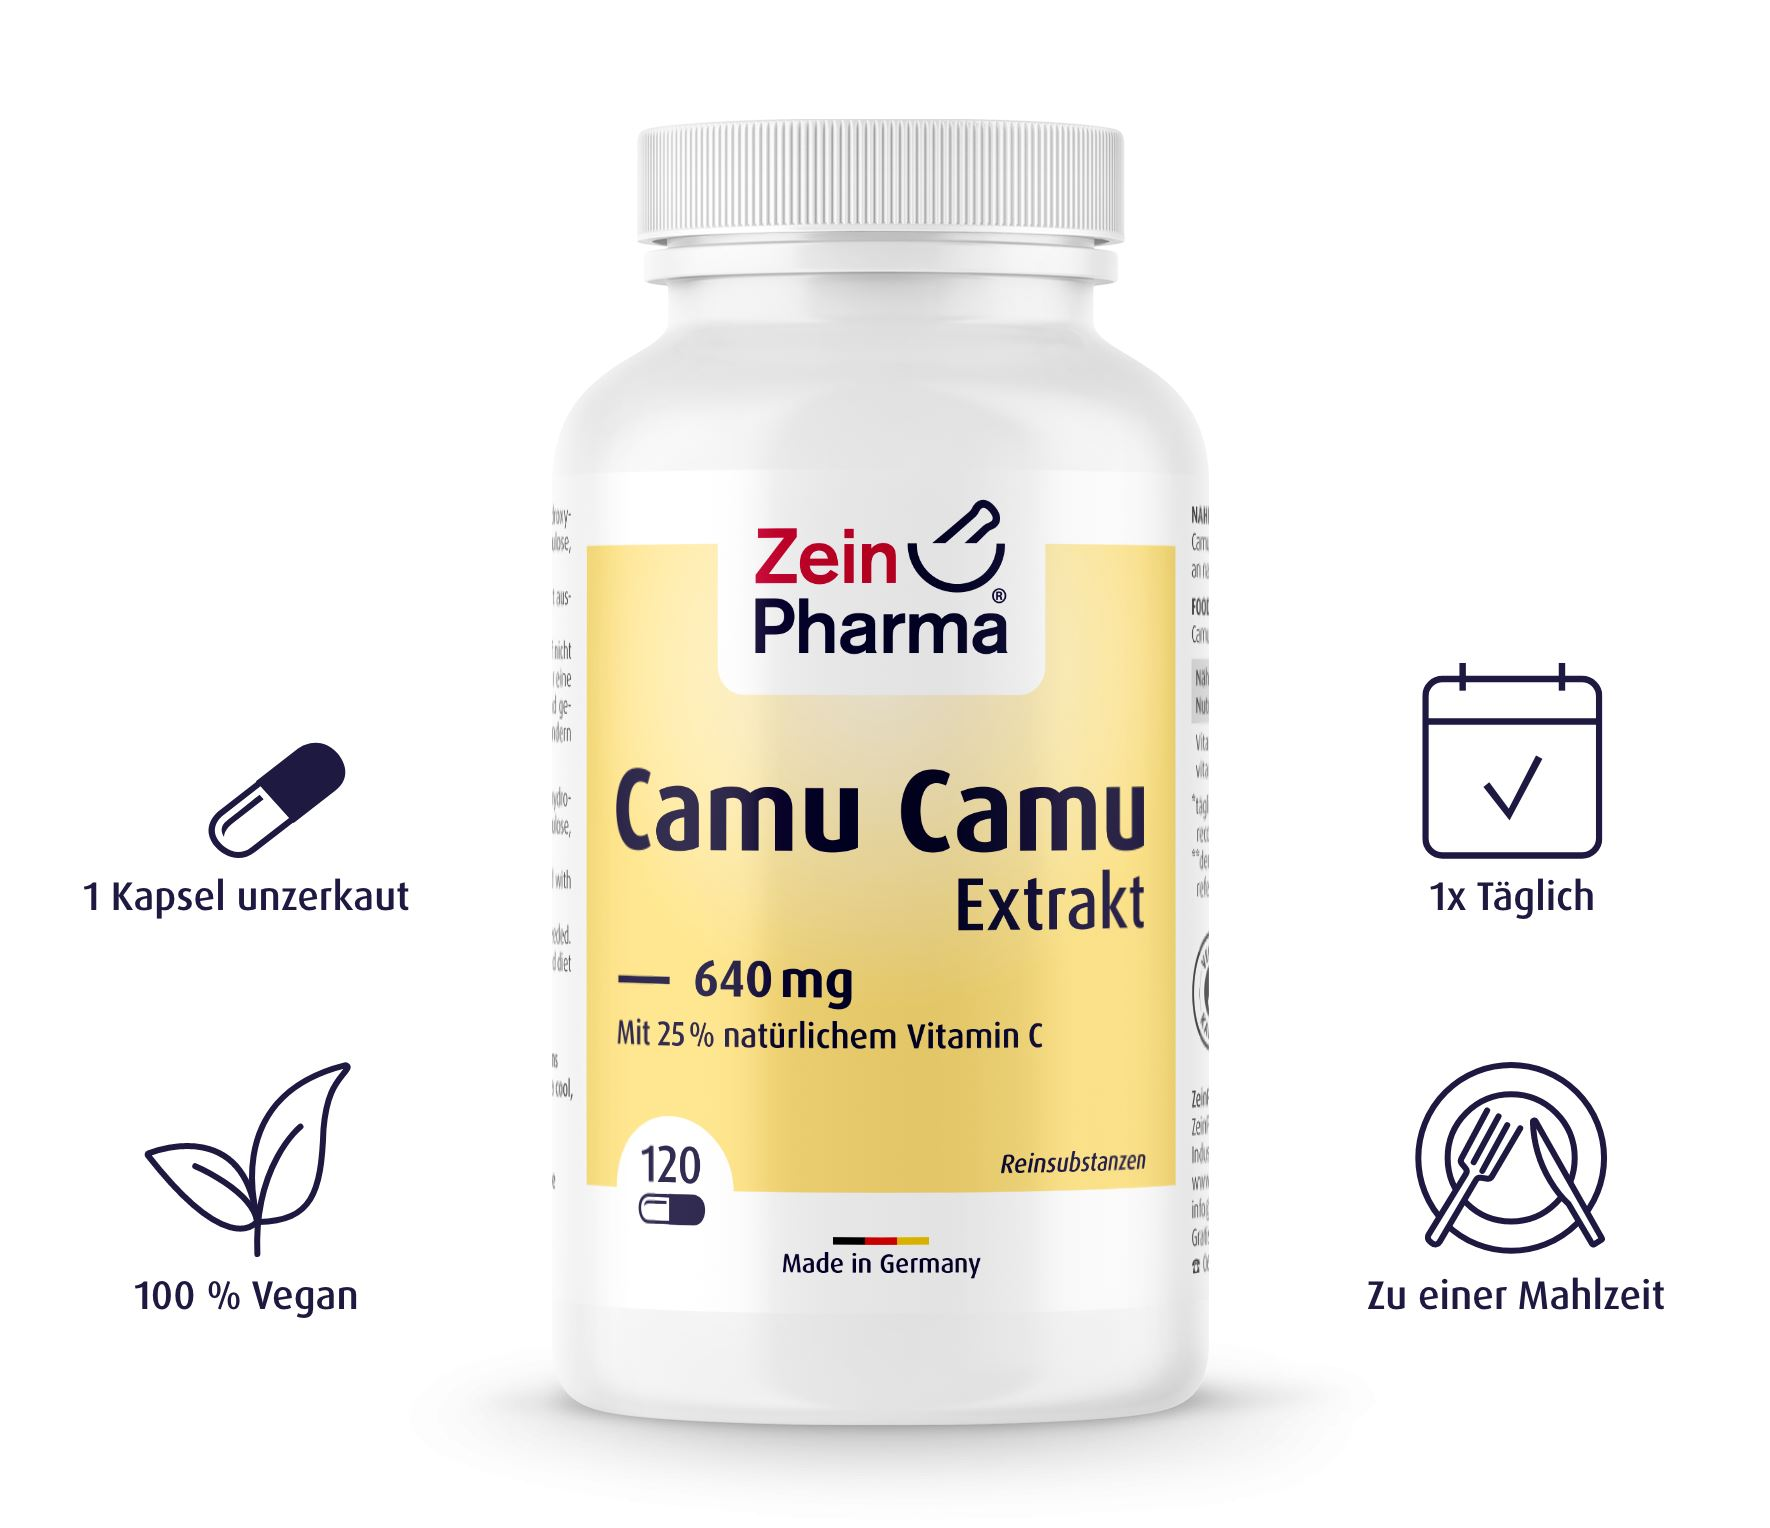 Camu Camu Extrakt von ZeinPharma - 120 Kapseln